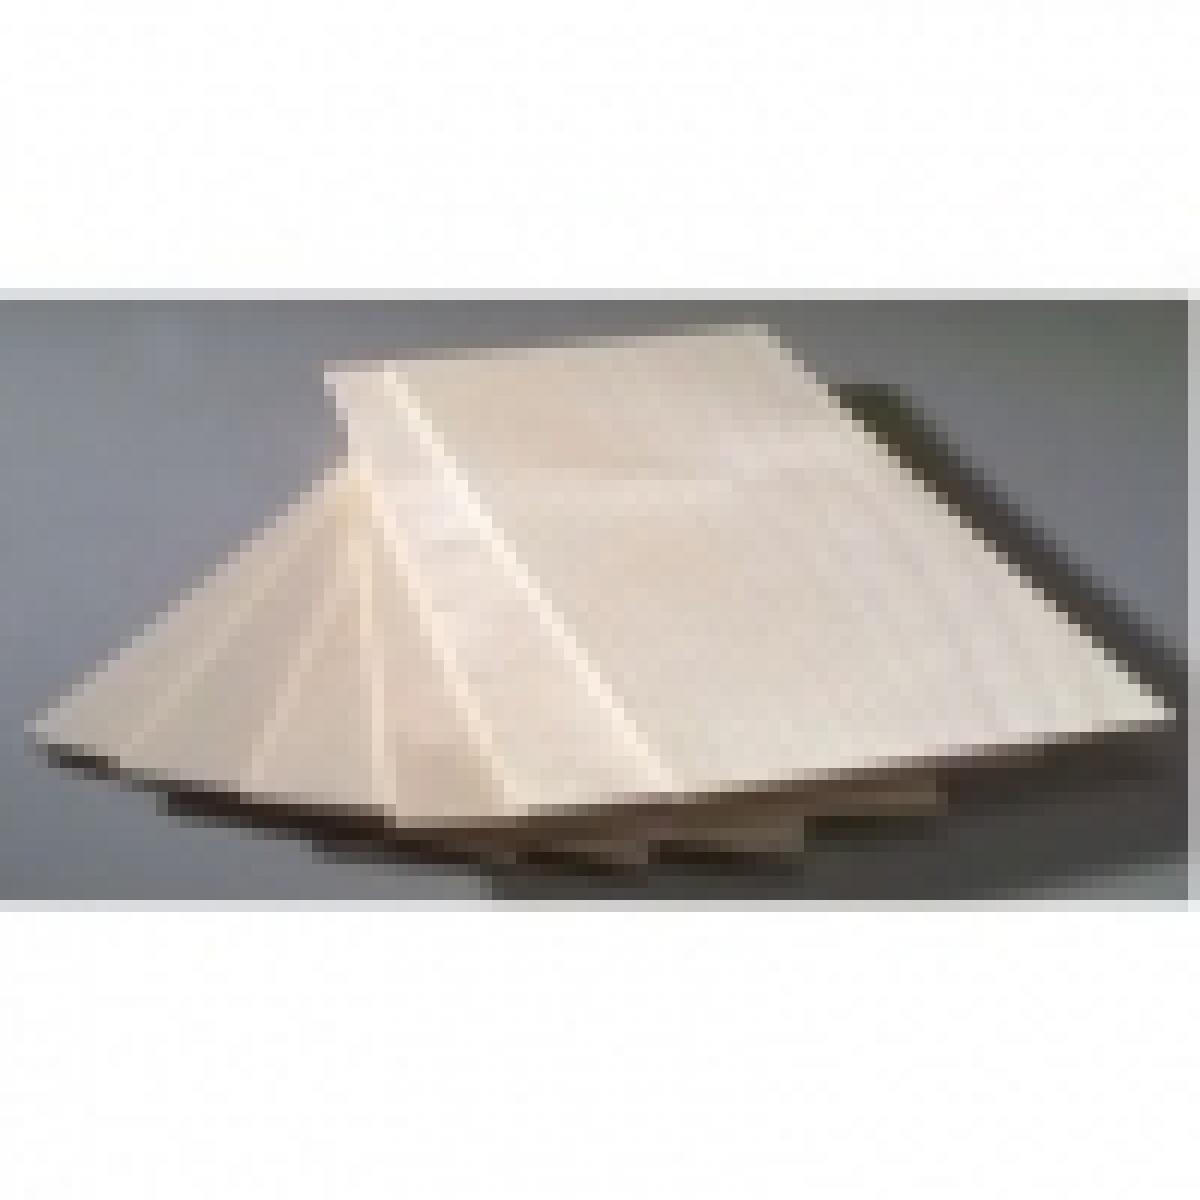 AIRCRAFT PLYWOOD (920mm x 460mm x 3mm)